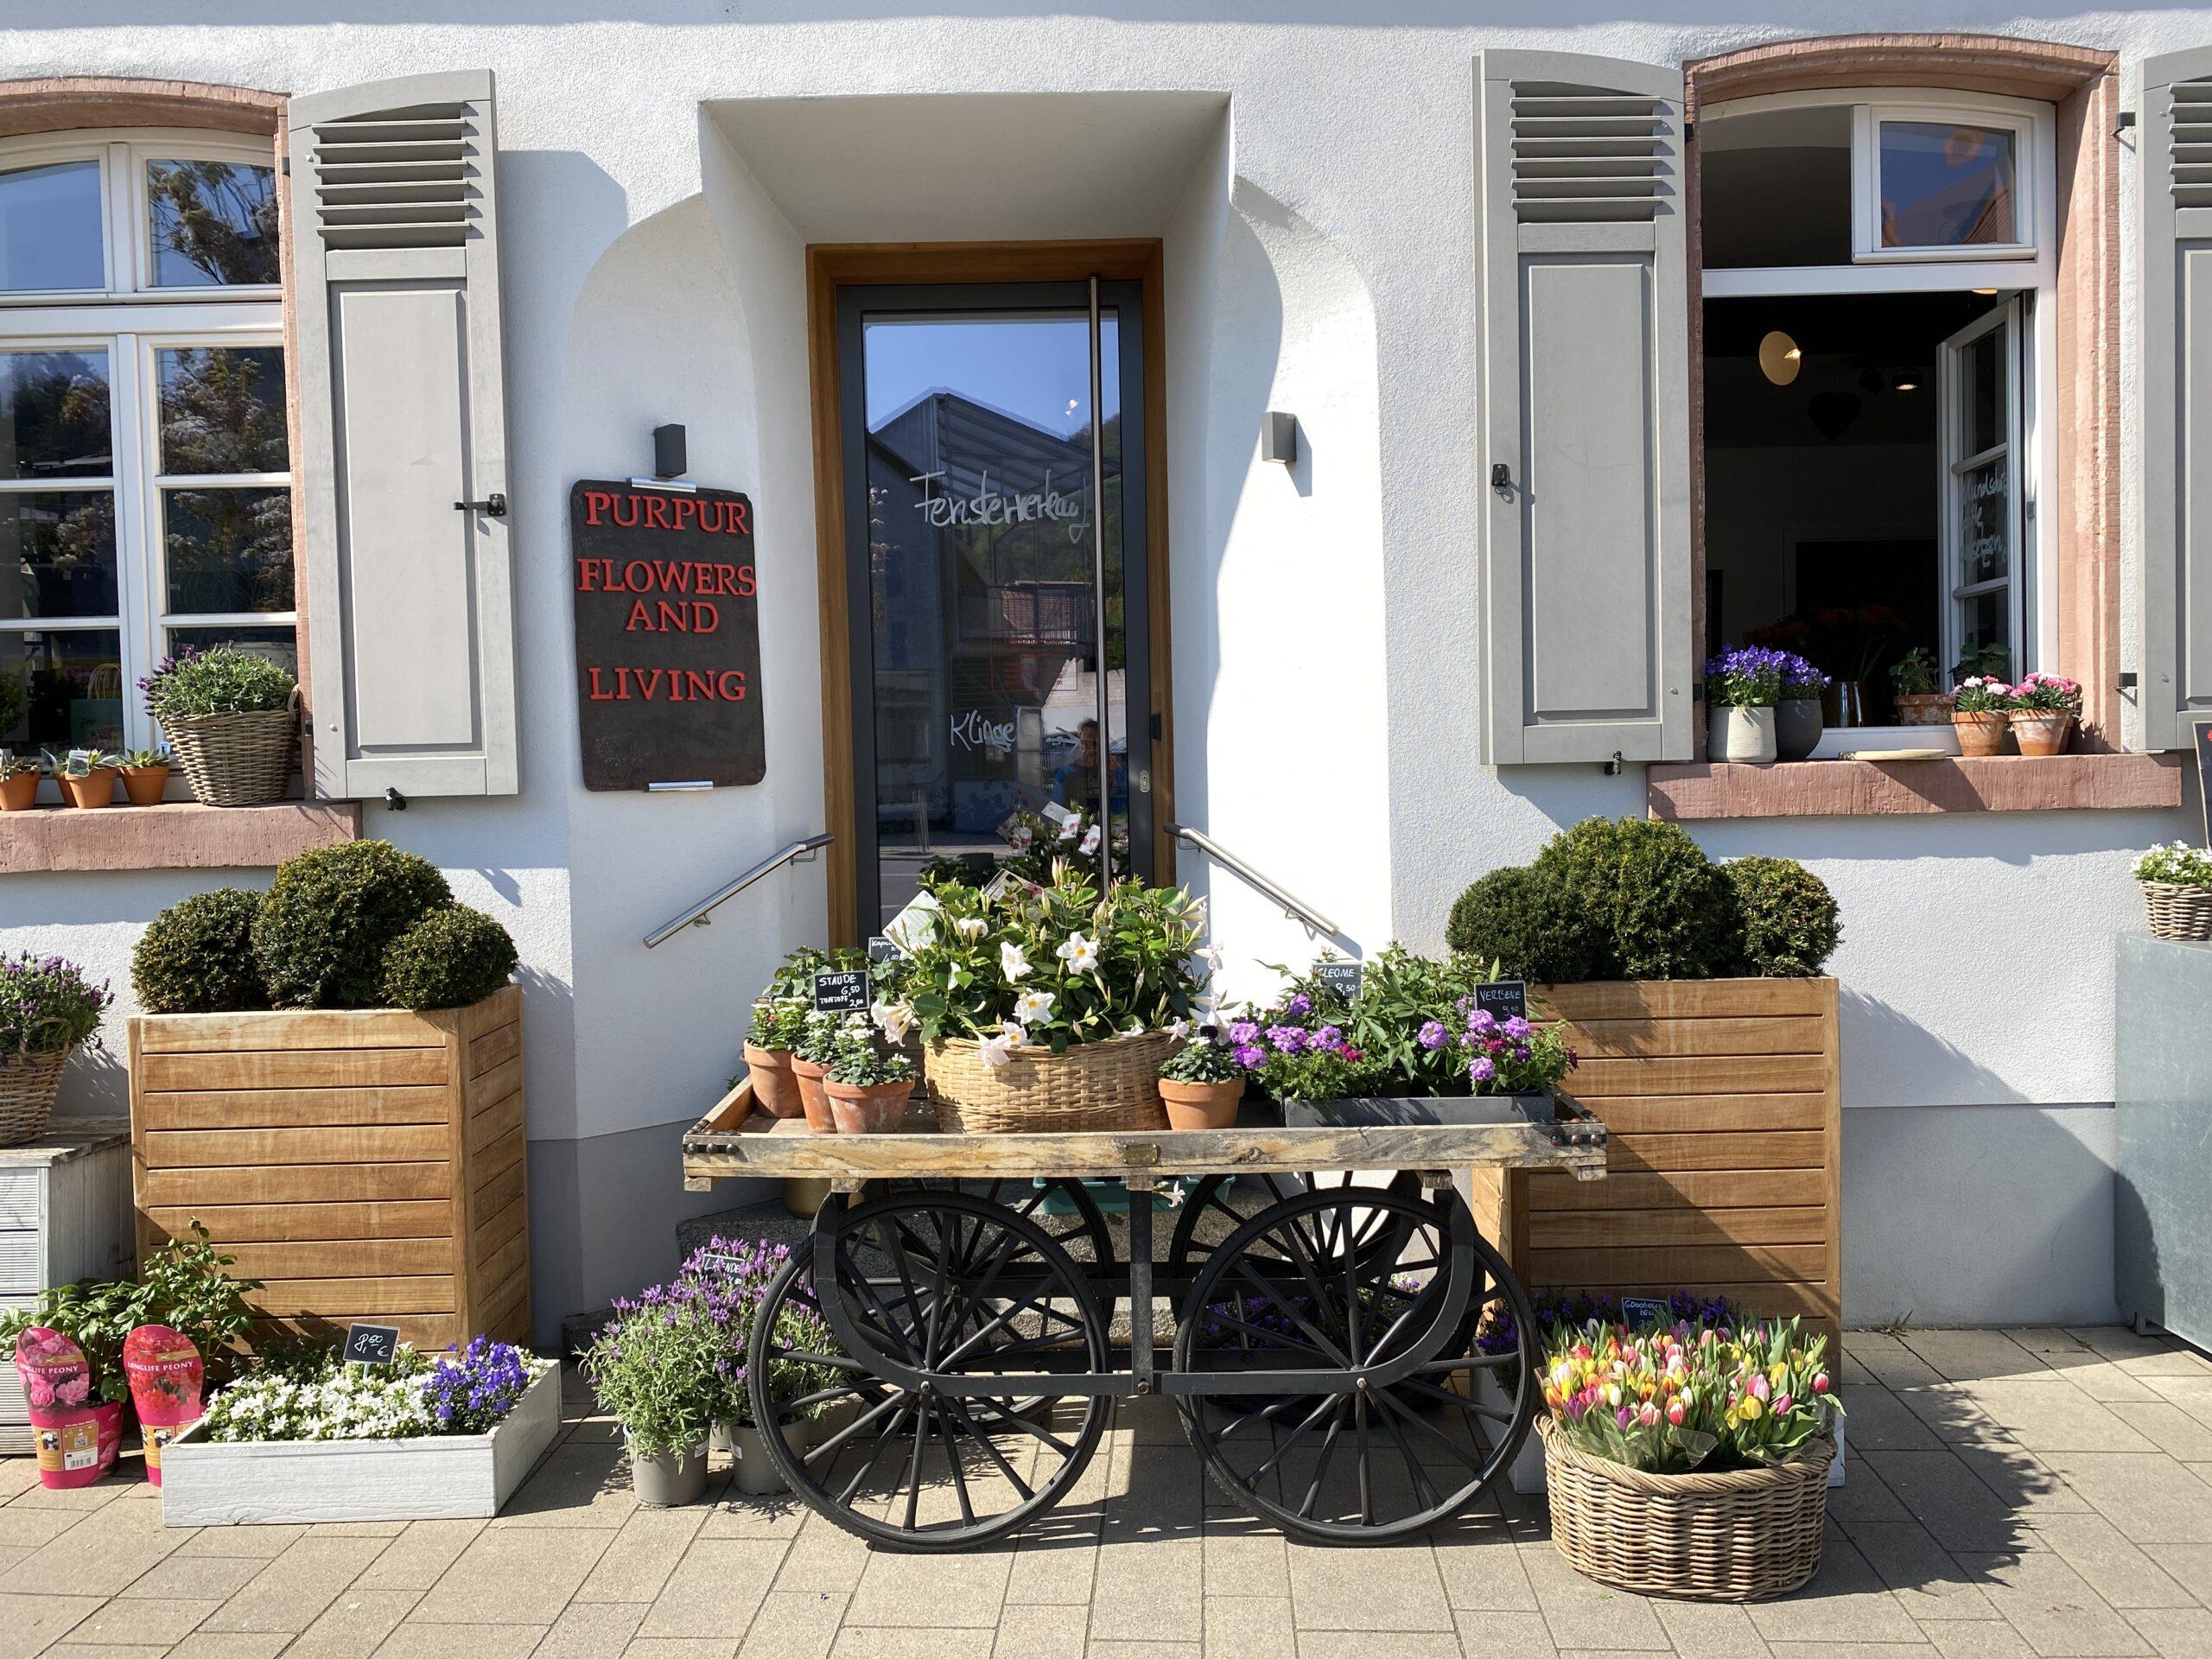 PurPur Flowers and Living in Bensheim-Auerbach